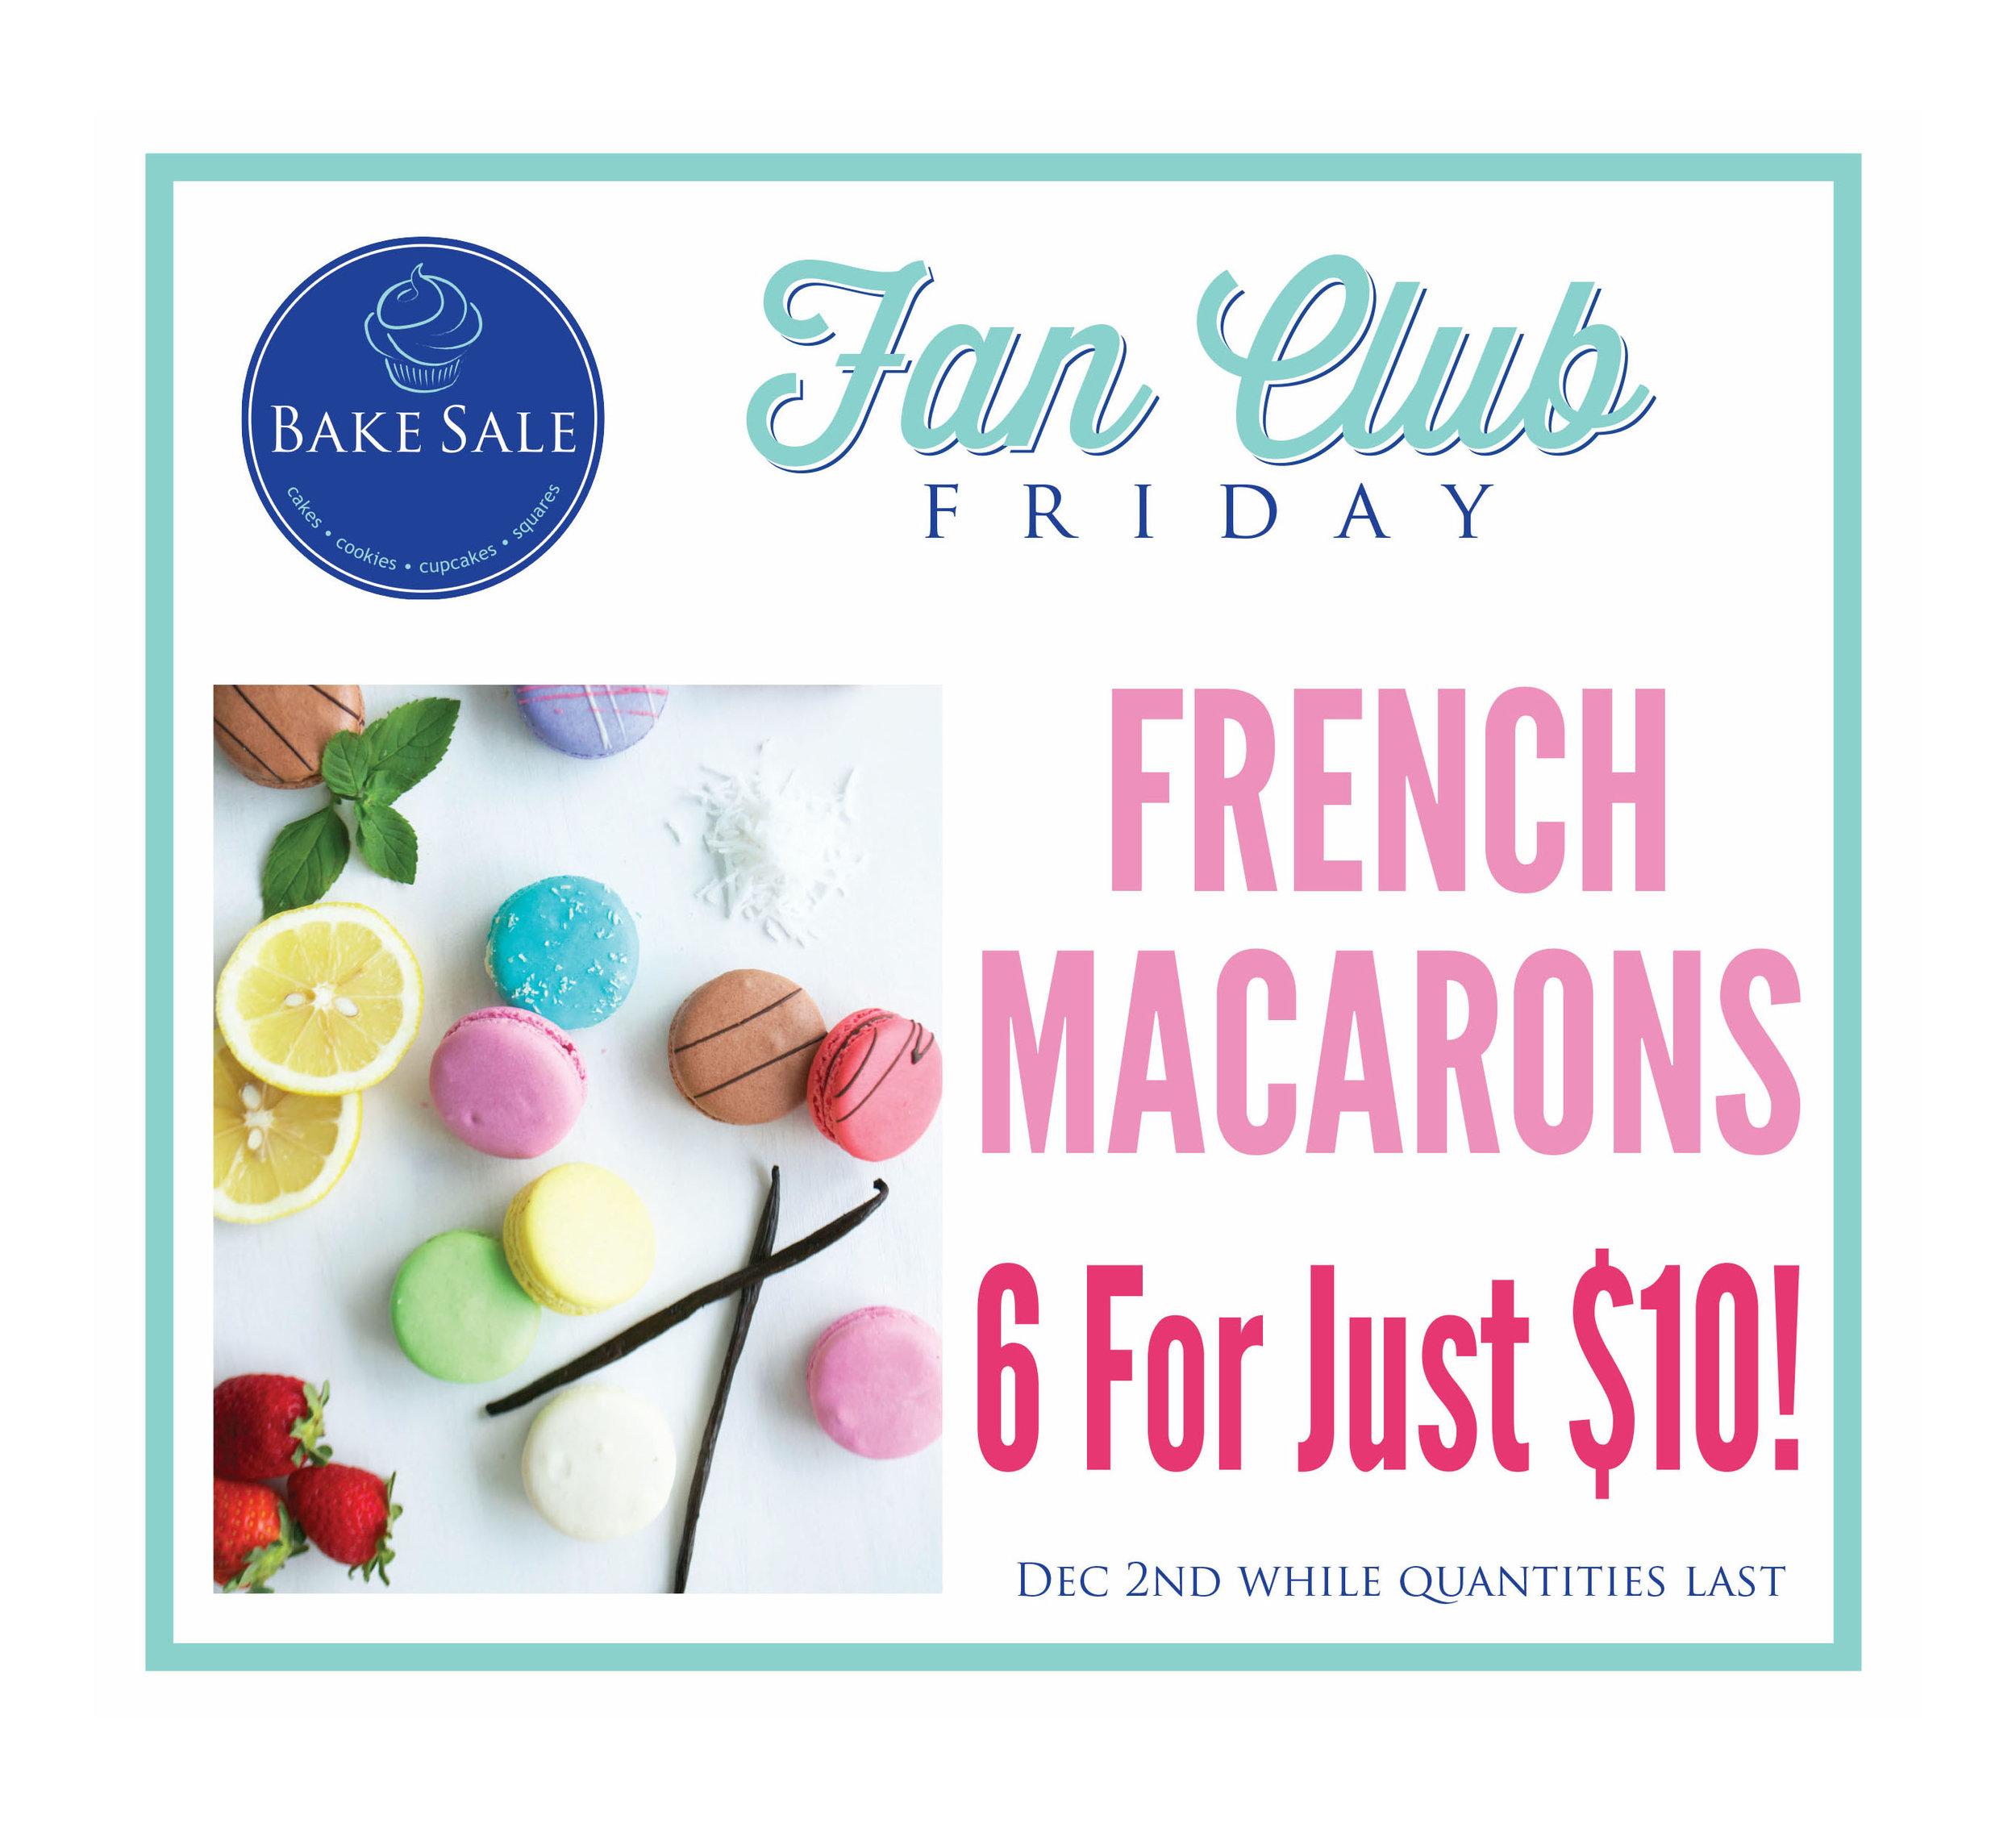 Bake Sale Fan Club French Macarons.jpg